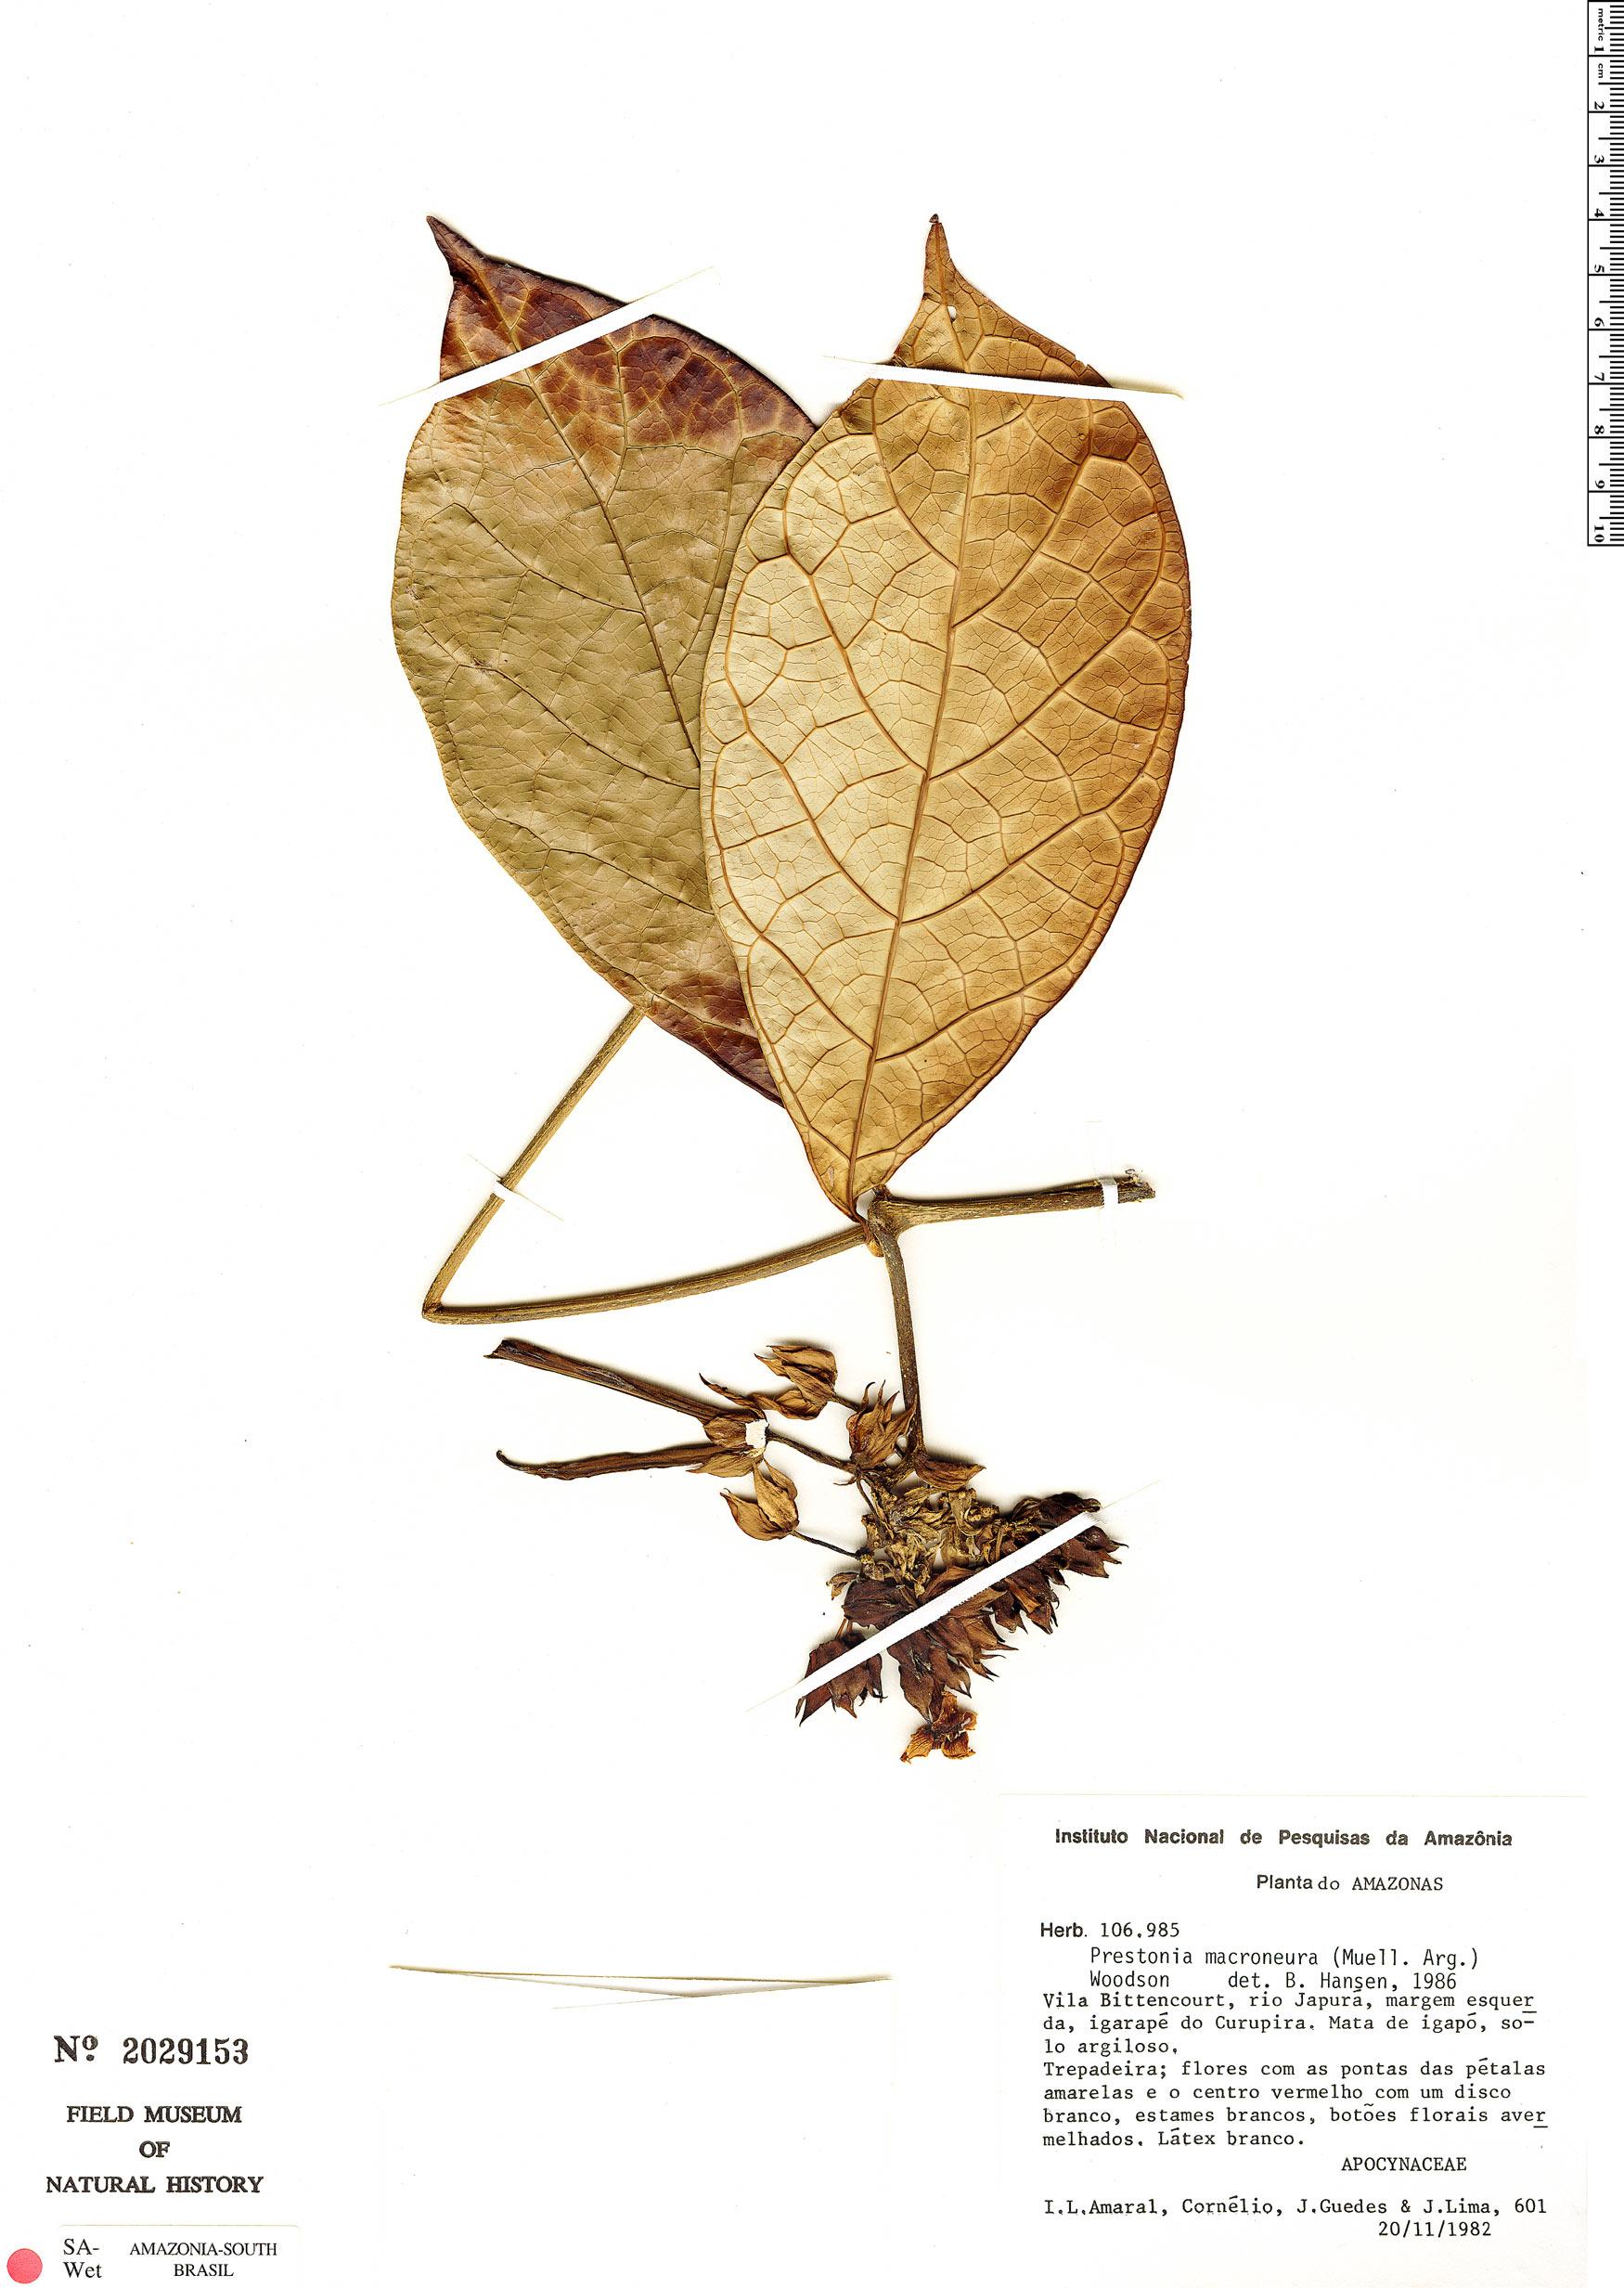 Specimen: Prestonia macroneura